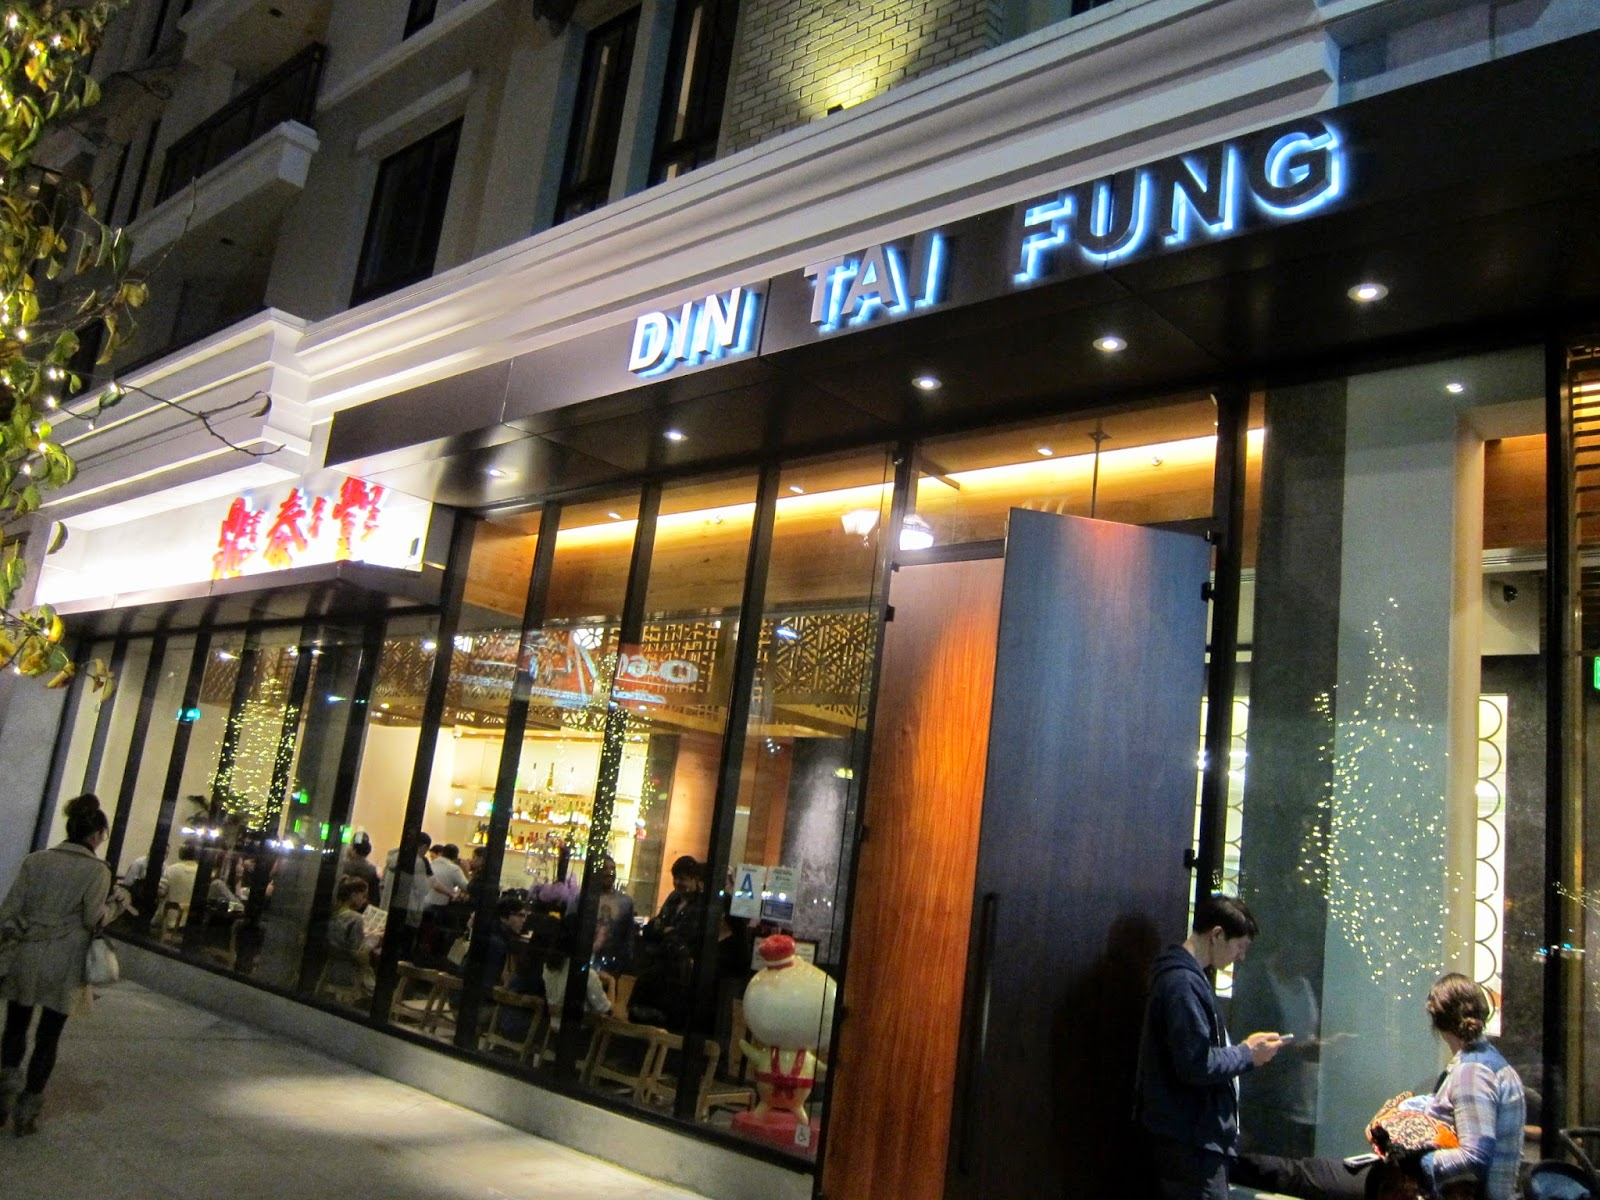 Doah S Hungry Din Tai Fung